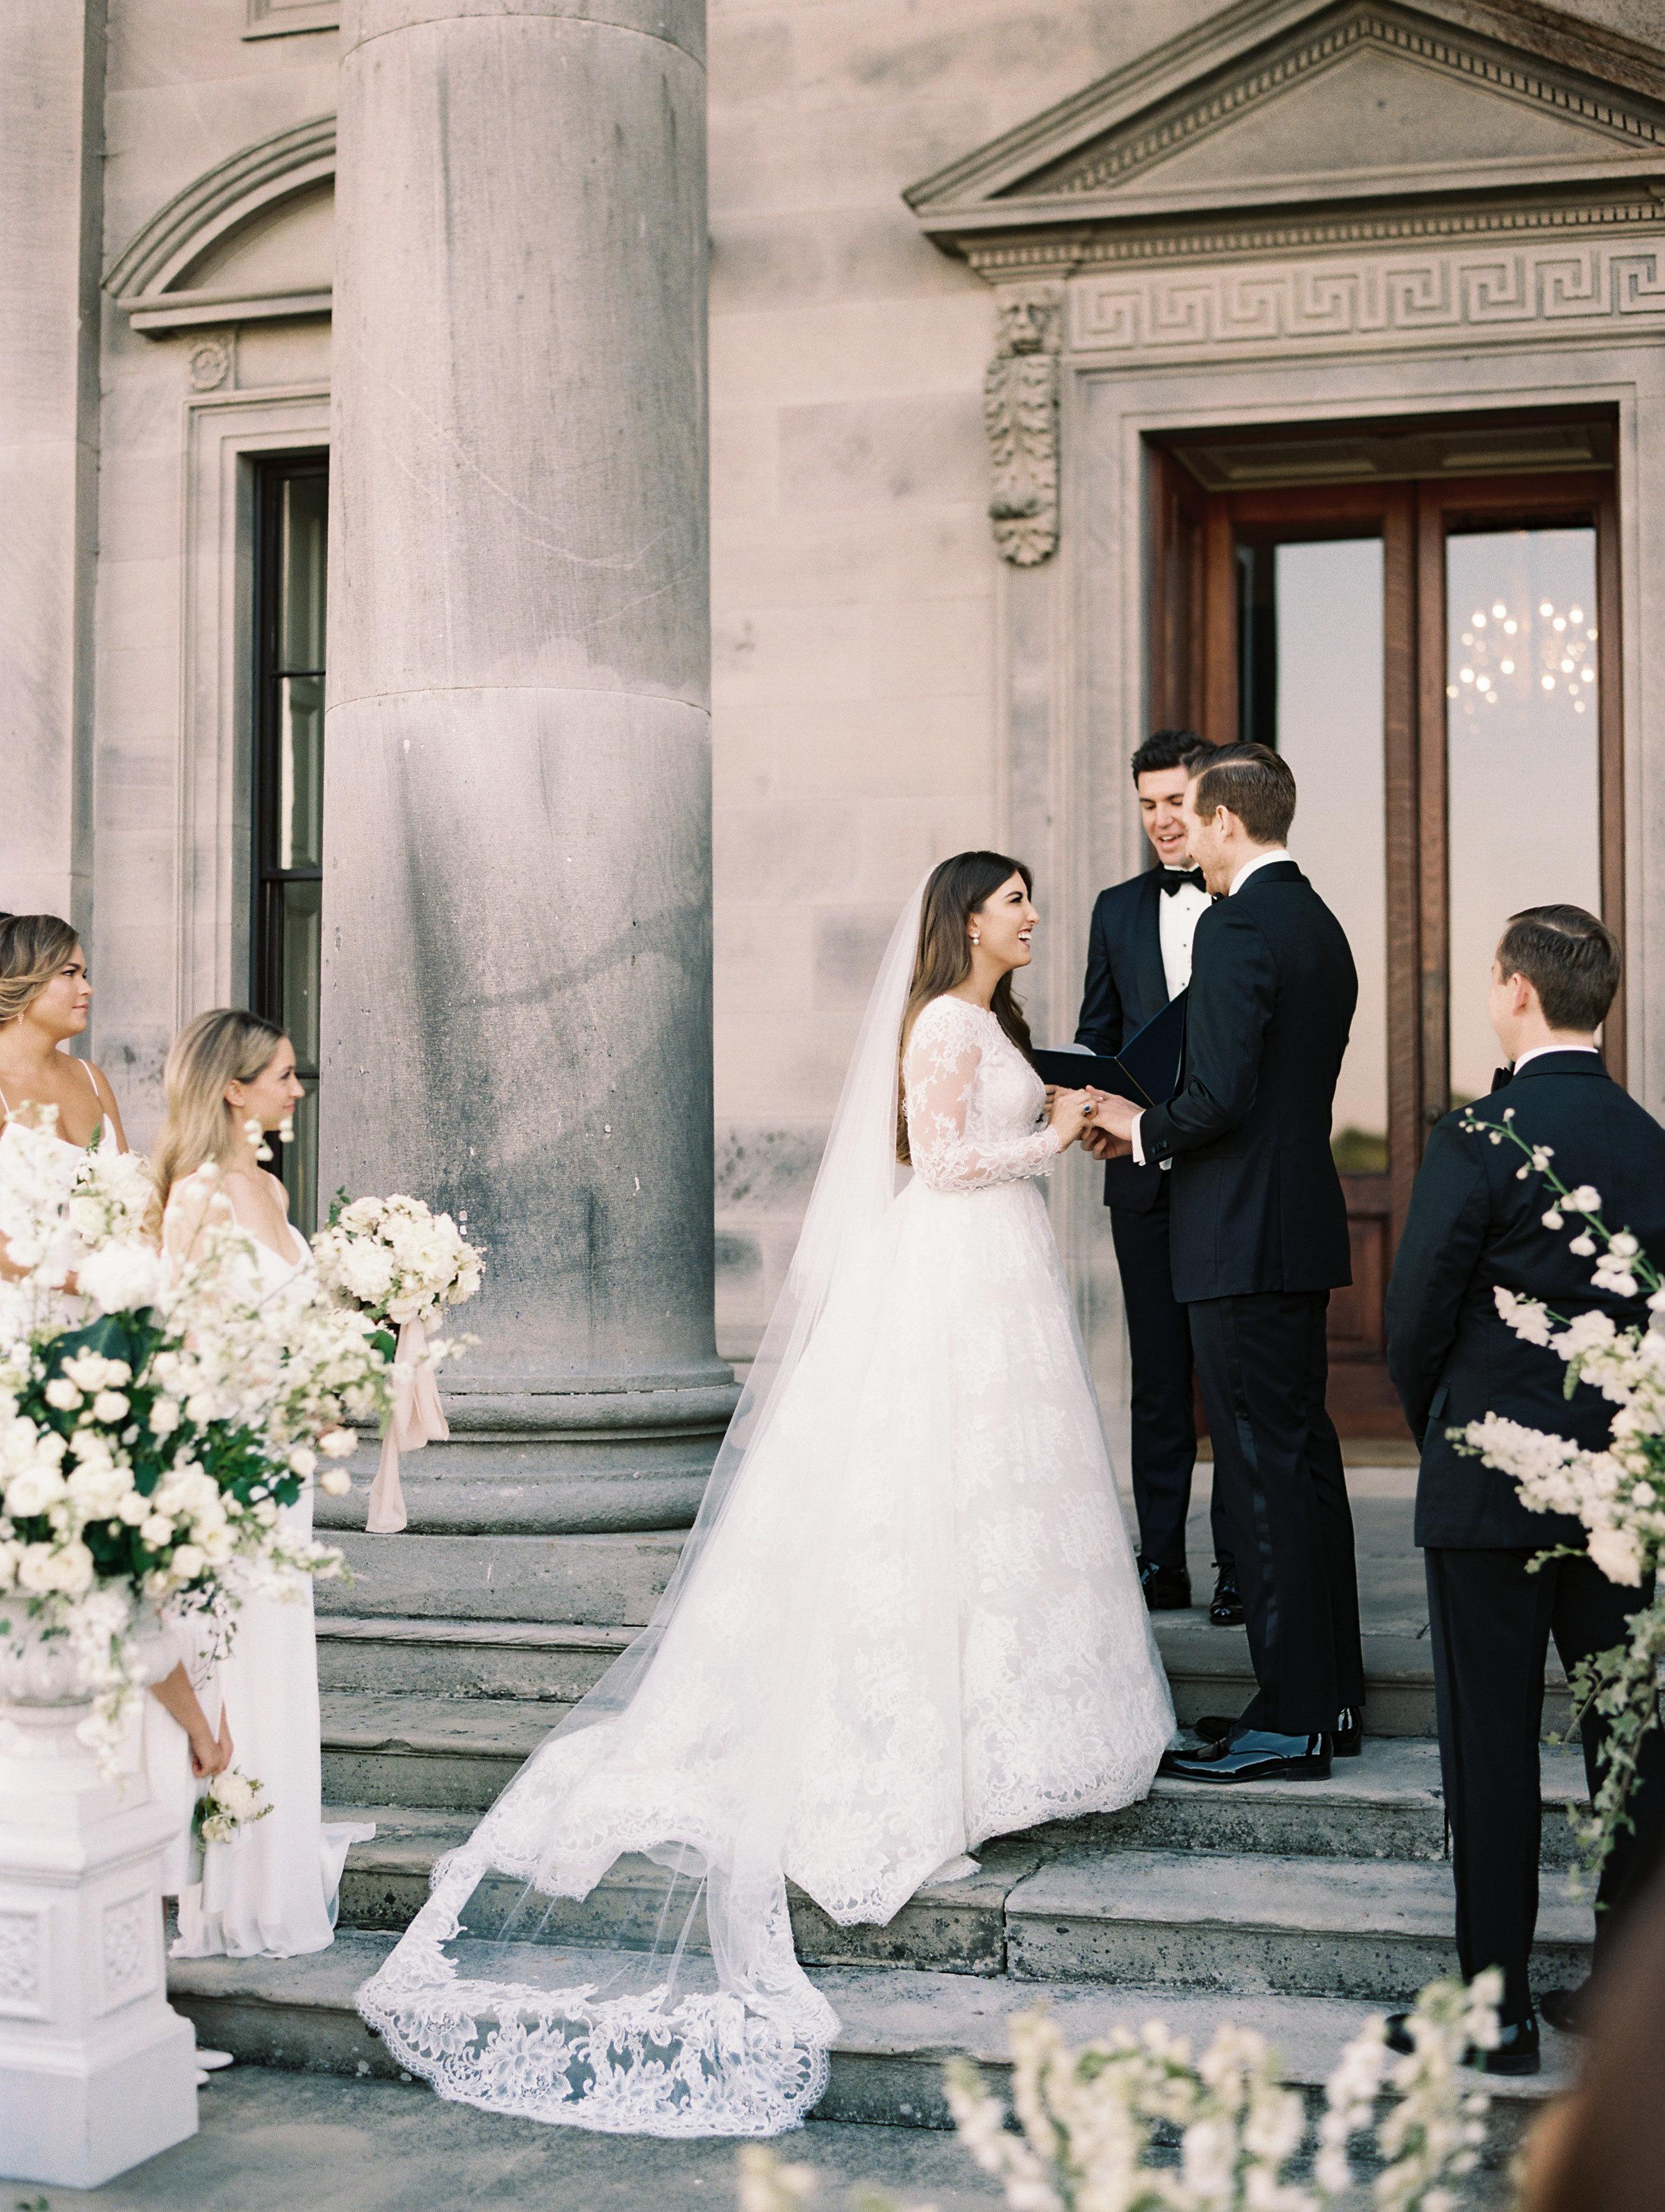 ramsey charles ireland wedding ceremony bride and groom on steps